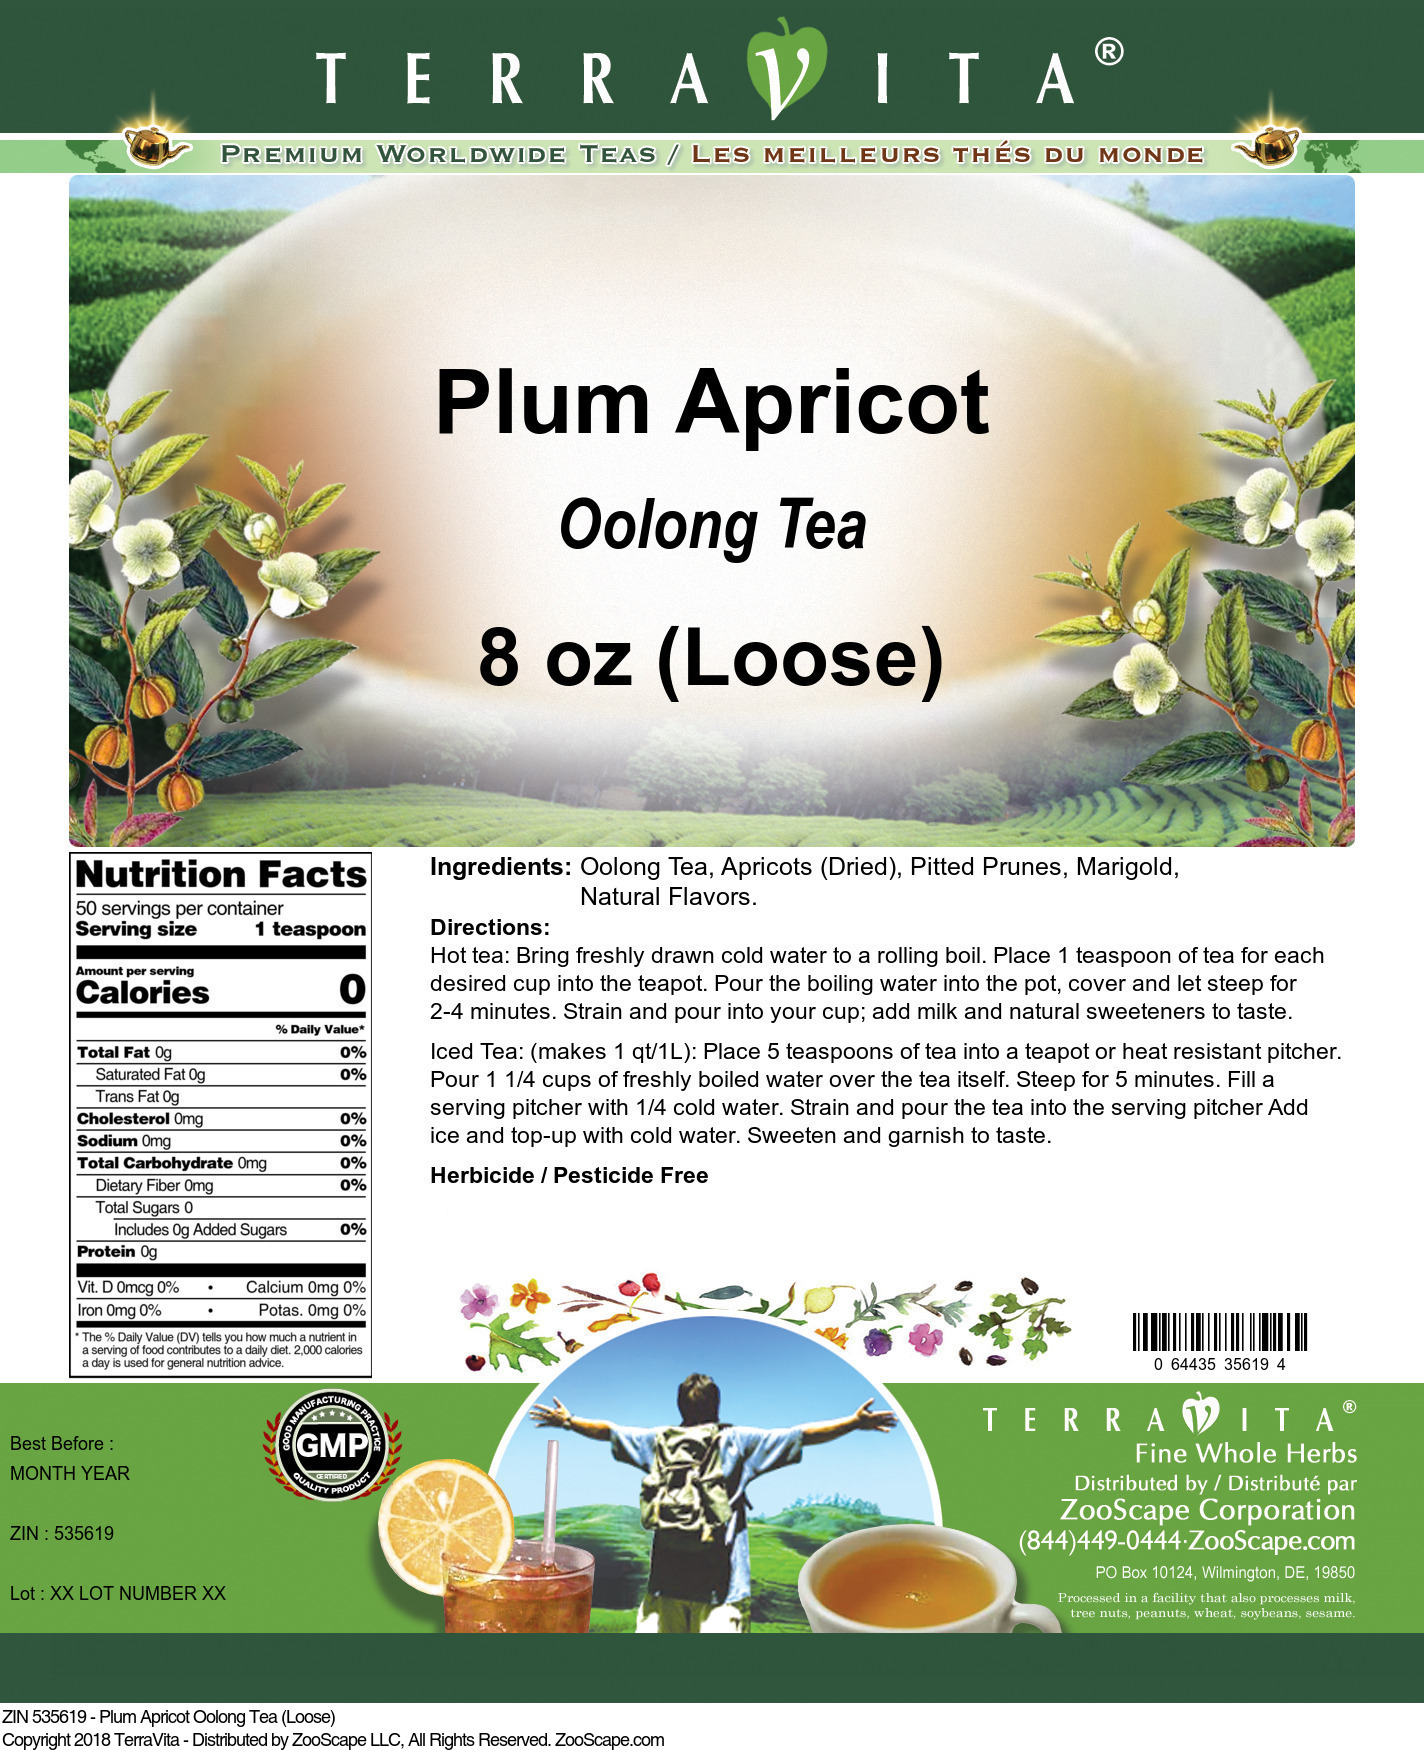 Plum Apricot Oolong Tea (Loose)